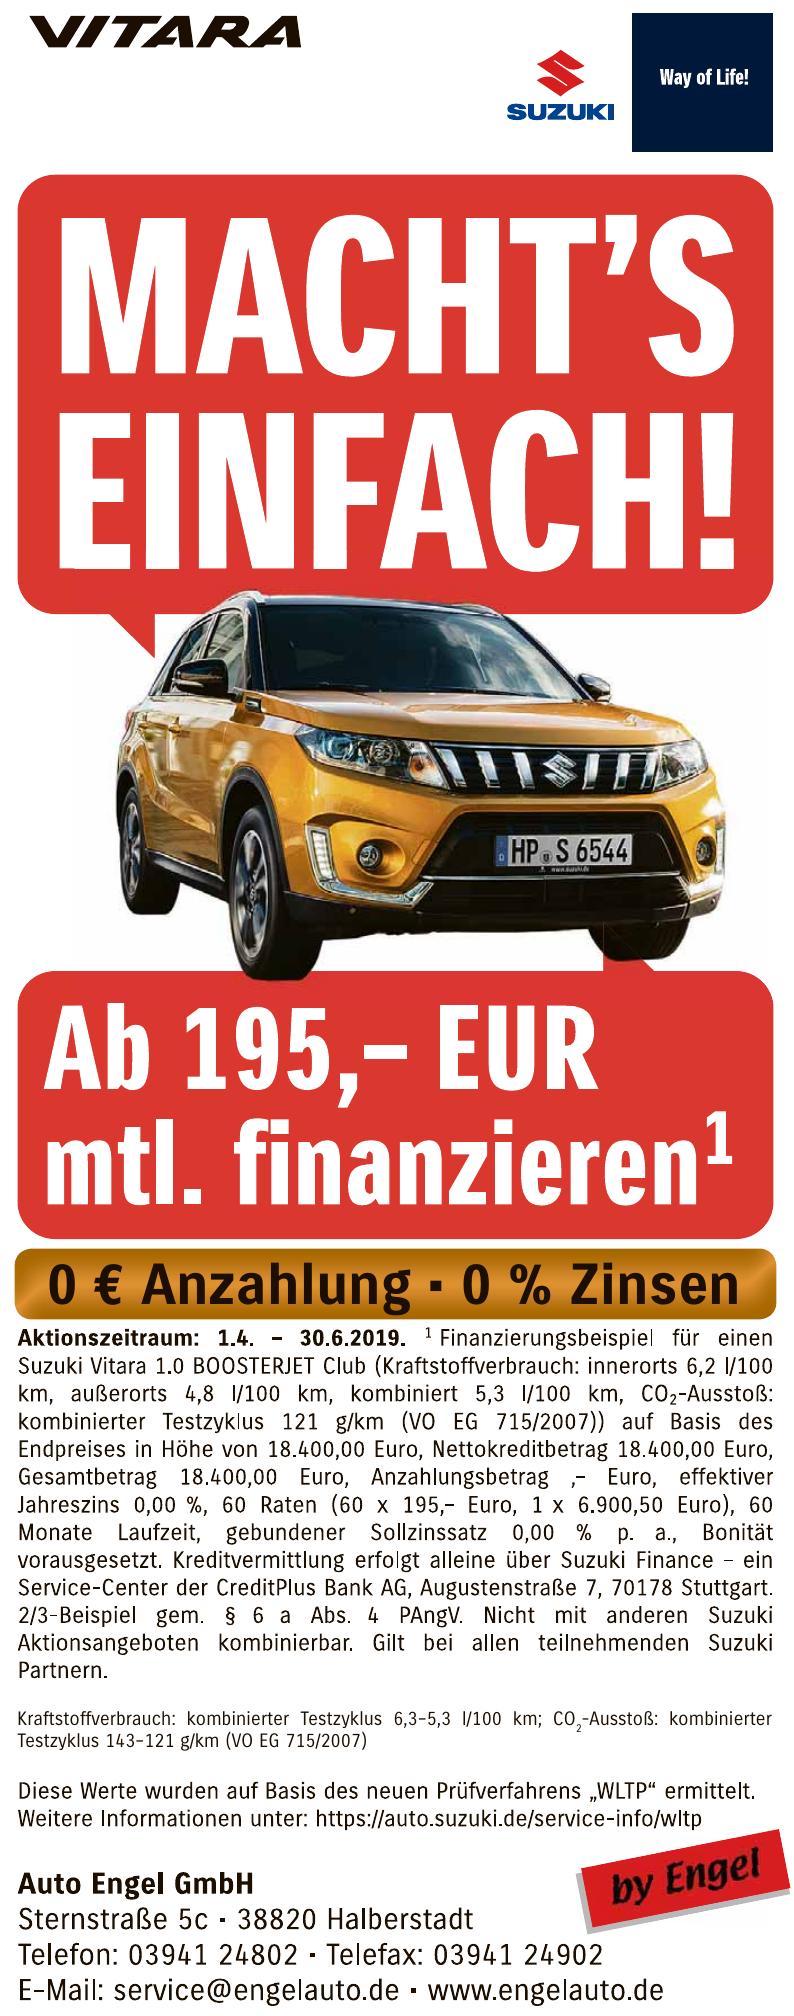 Auto-Engel GmbH